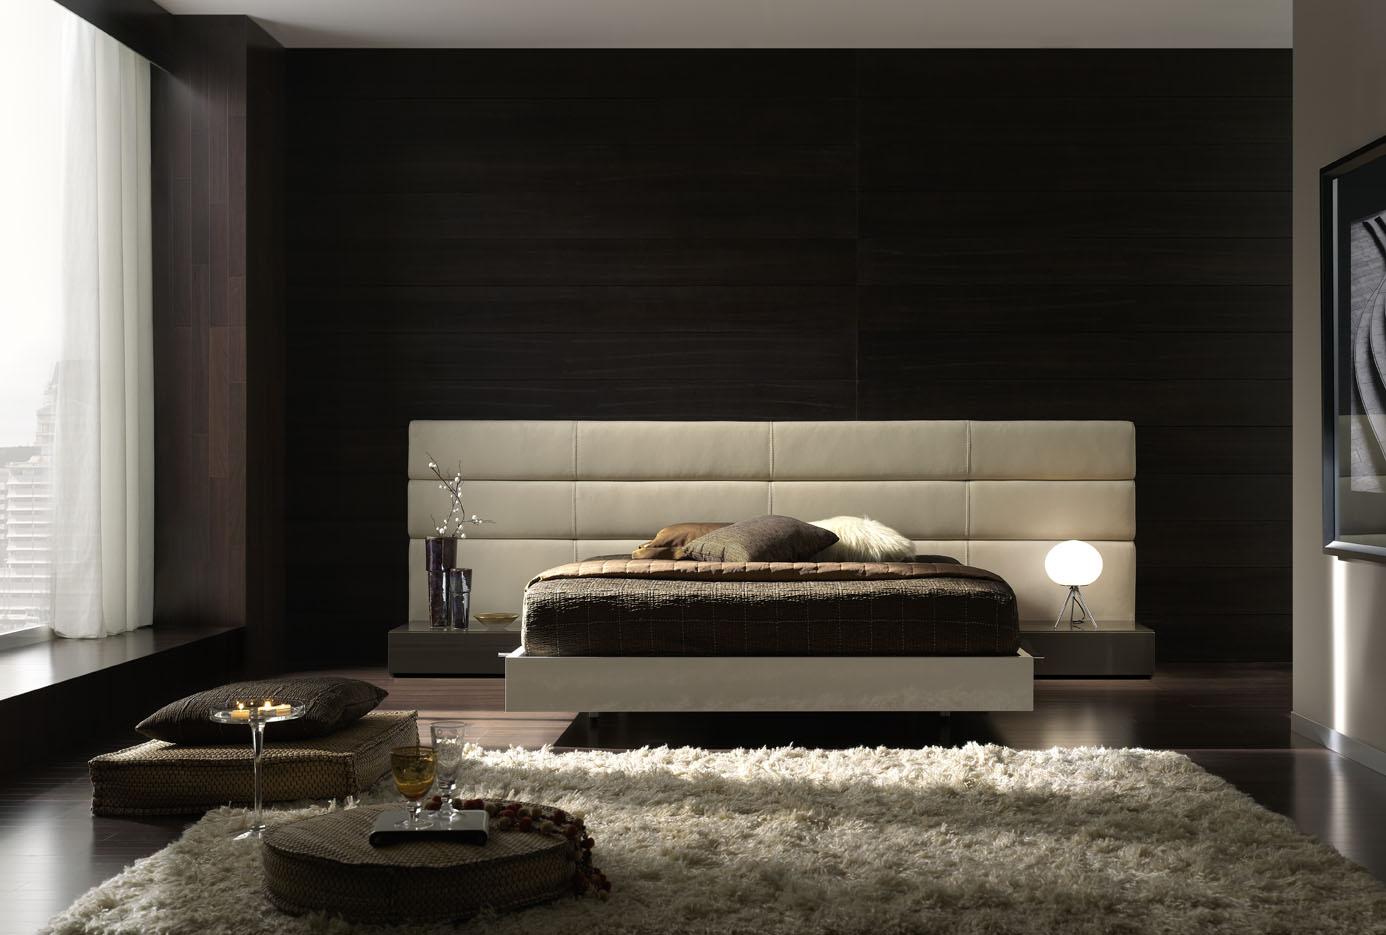 301 moved permanently - Luces de pared para dormitorio ...